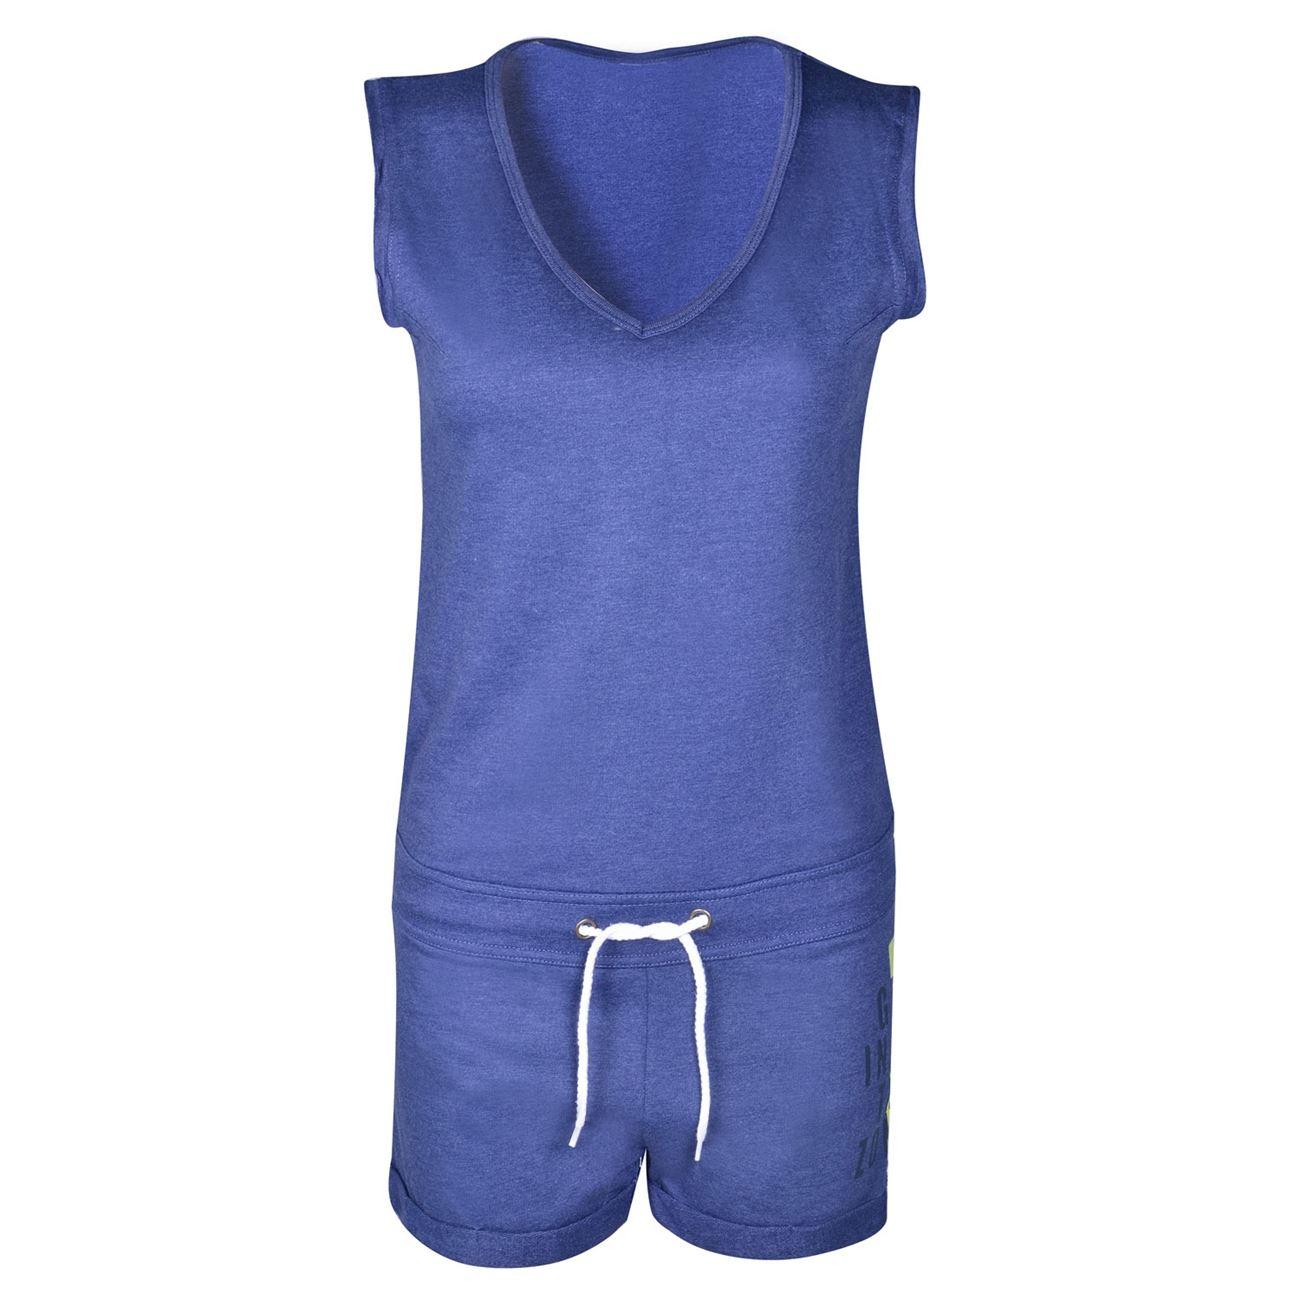 4184ef45fe Σαλοπέτα Γυναικεία Μπλε Λευκό Κορδόνι - One Size   Σαλοπέτες